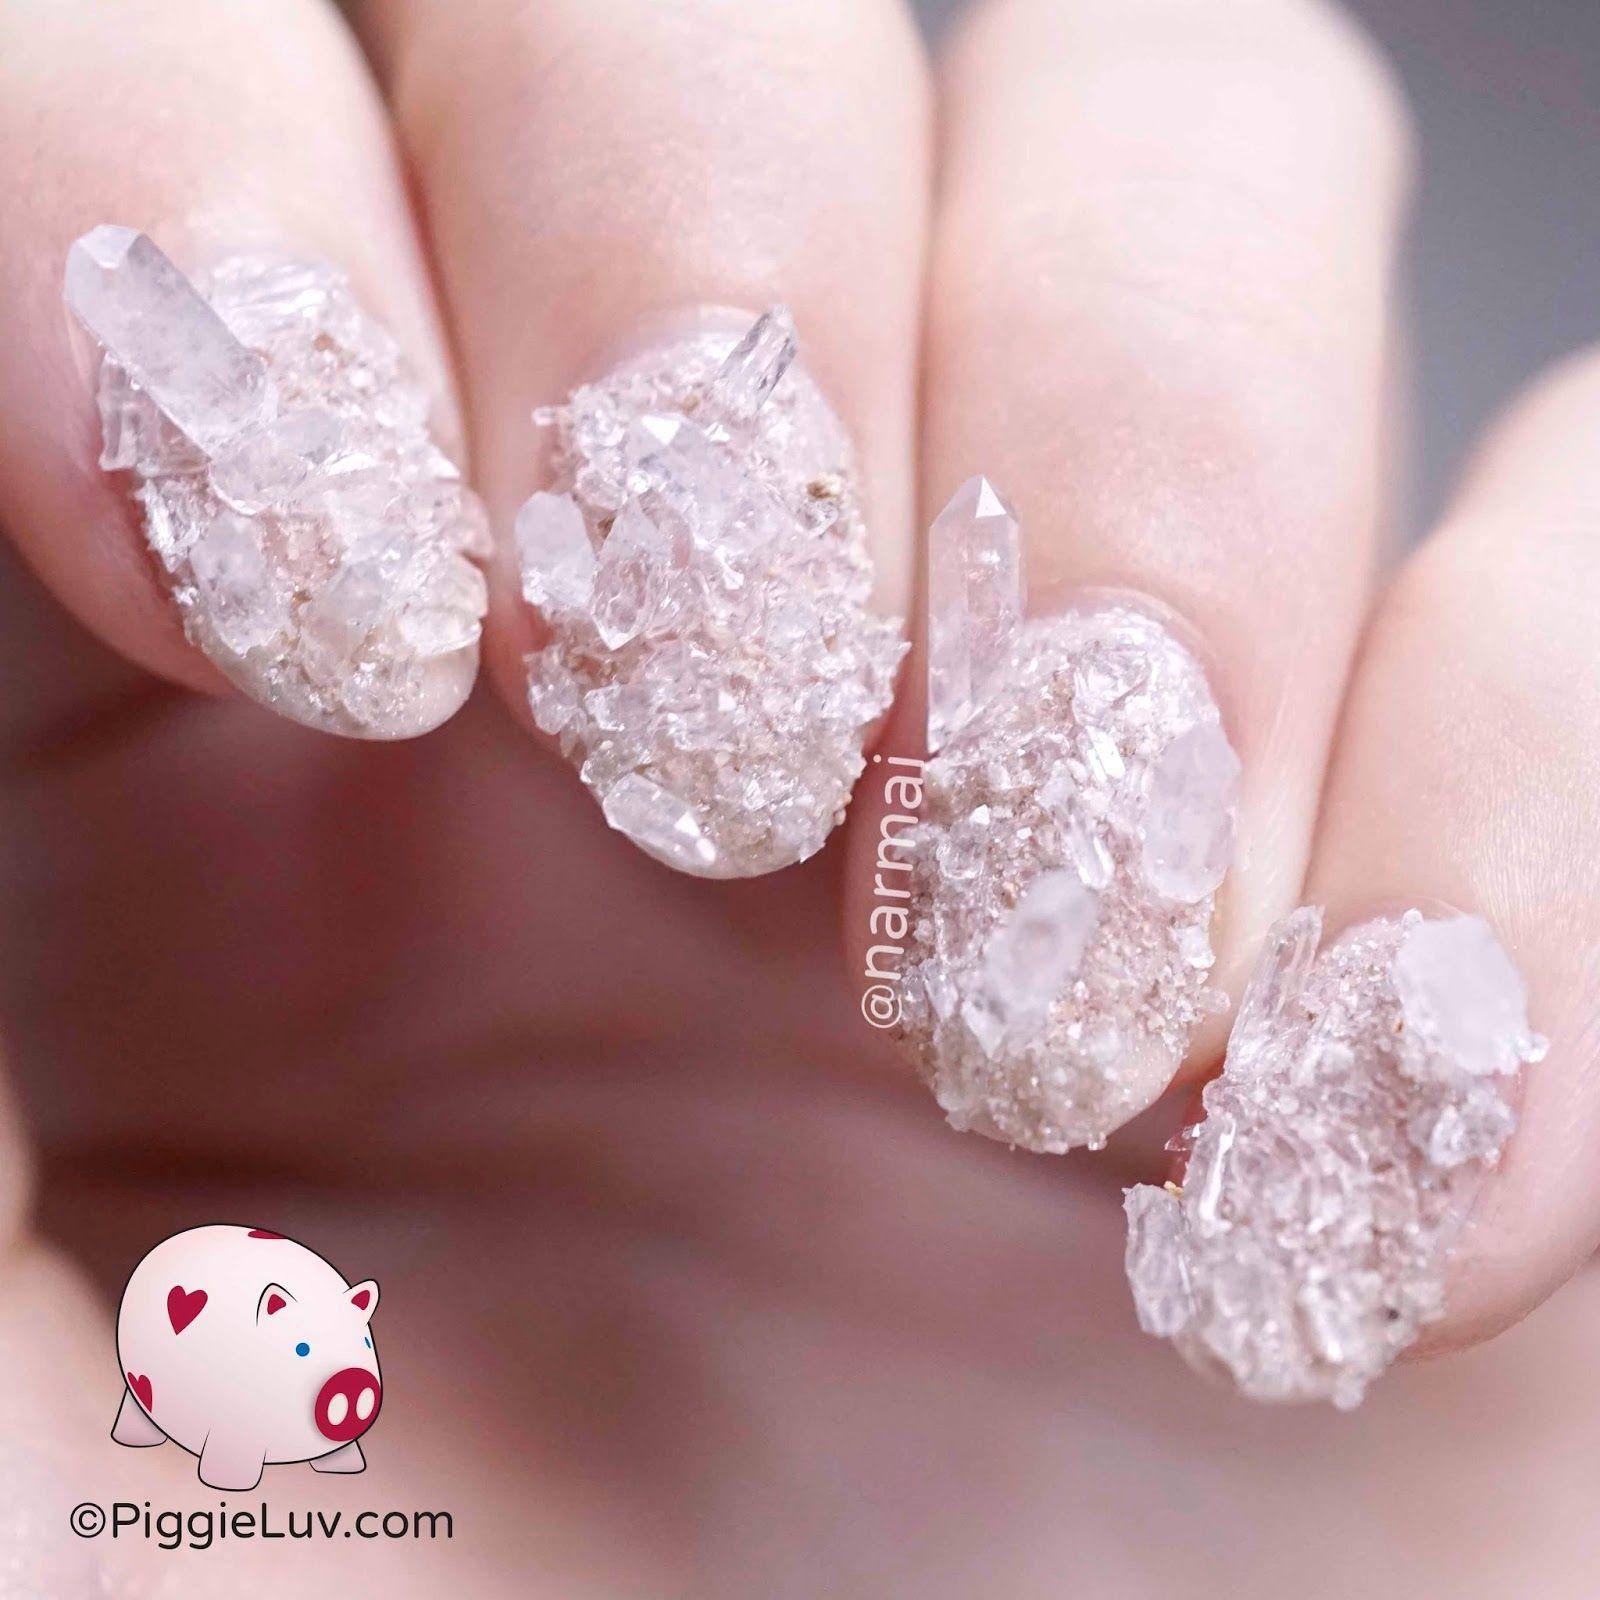 Rock crystal/quartz nail art